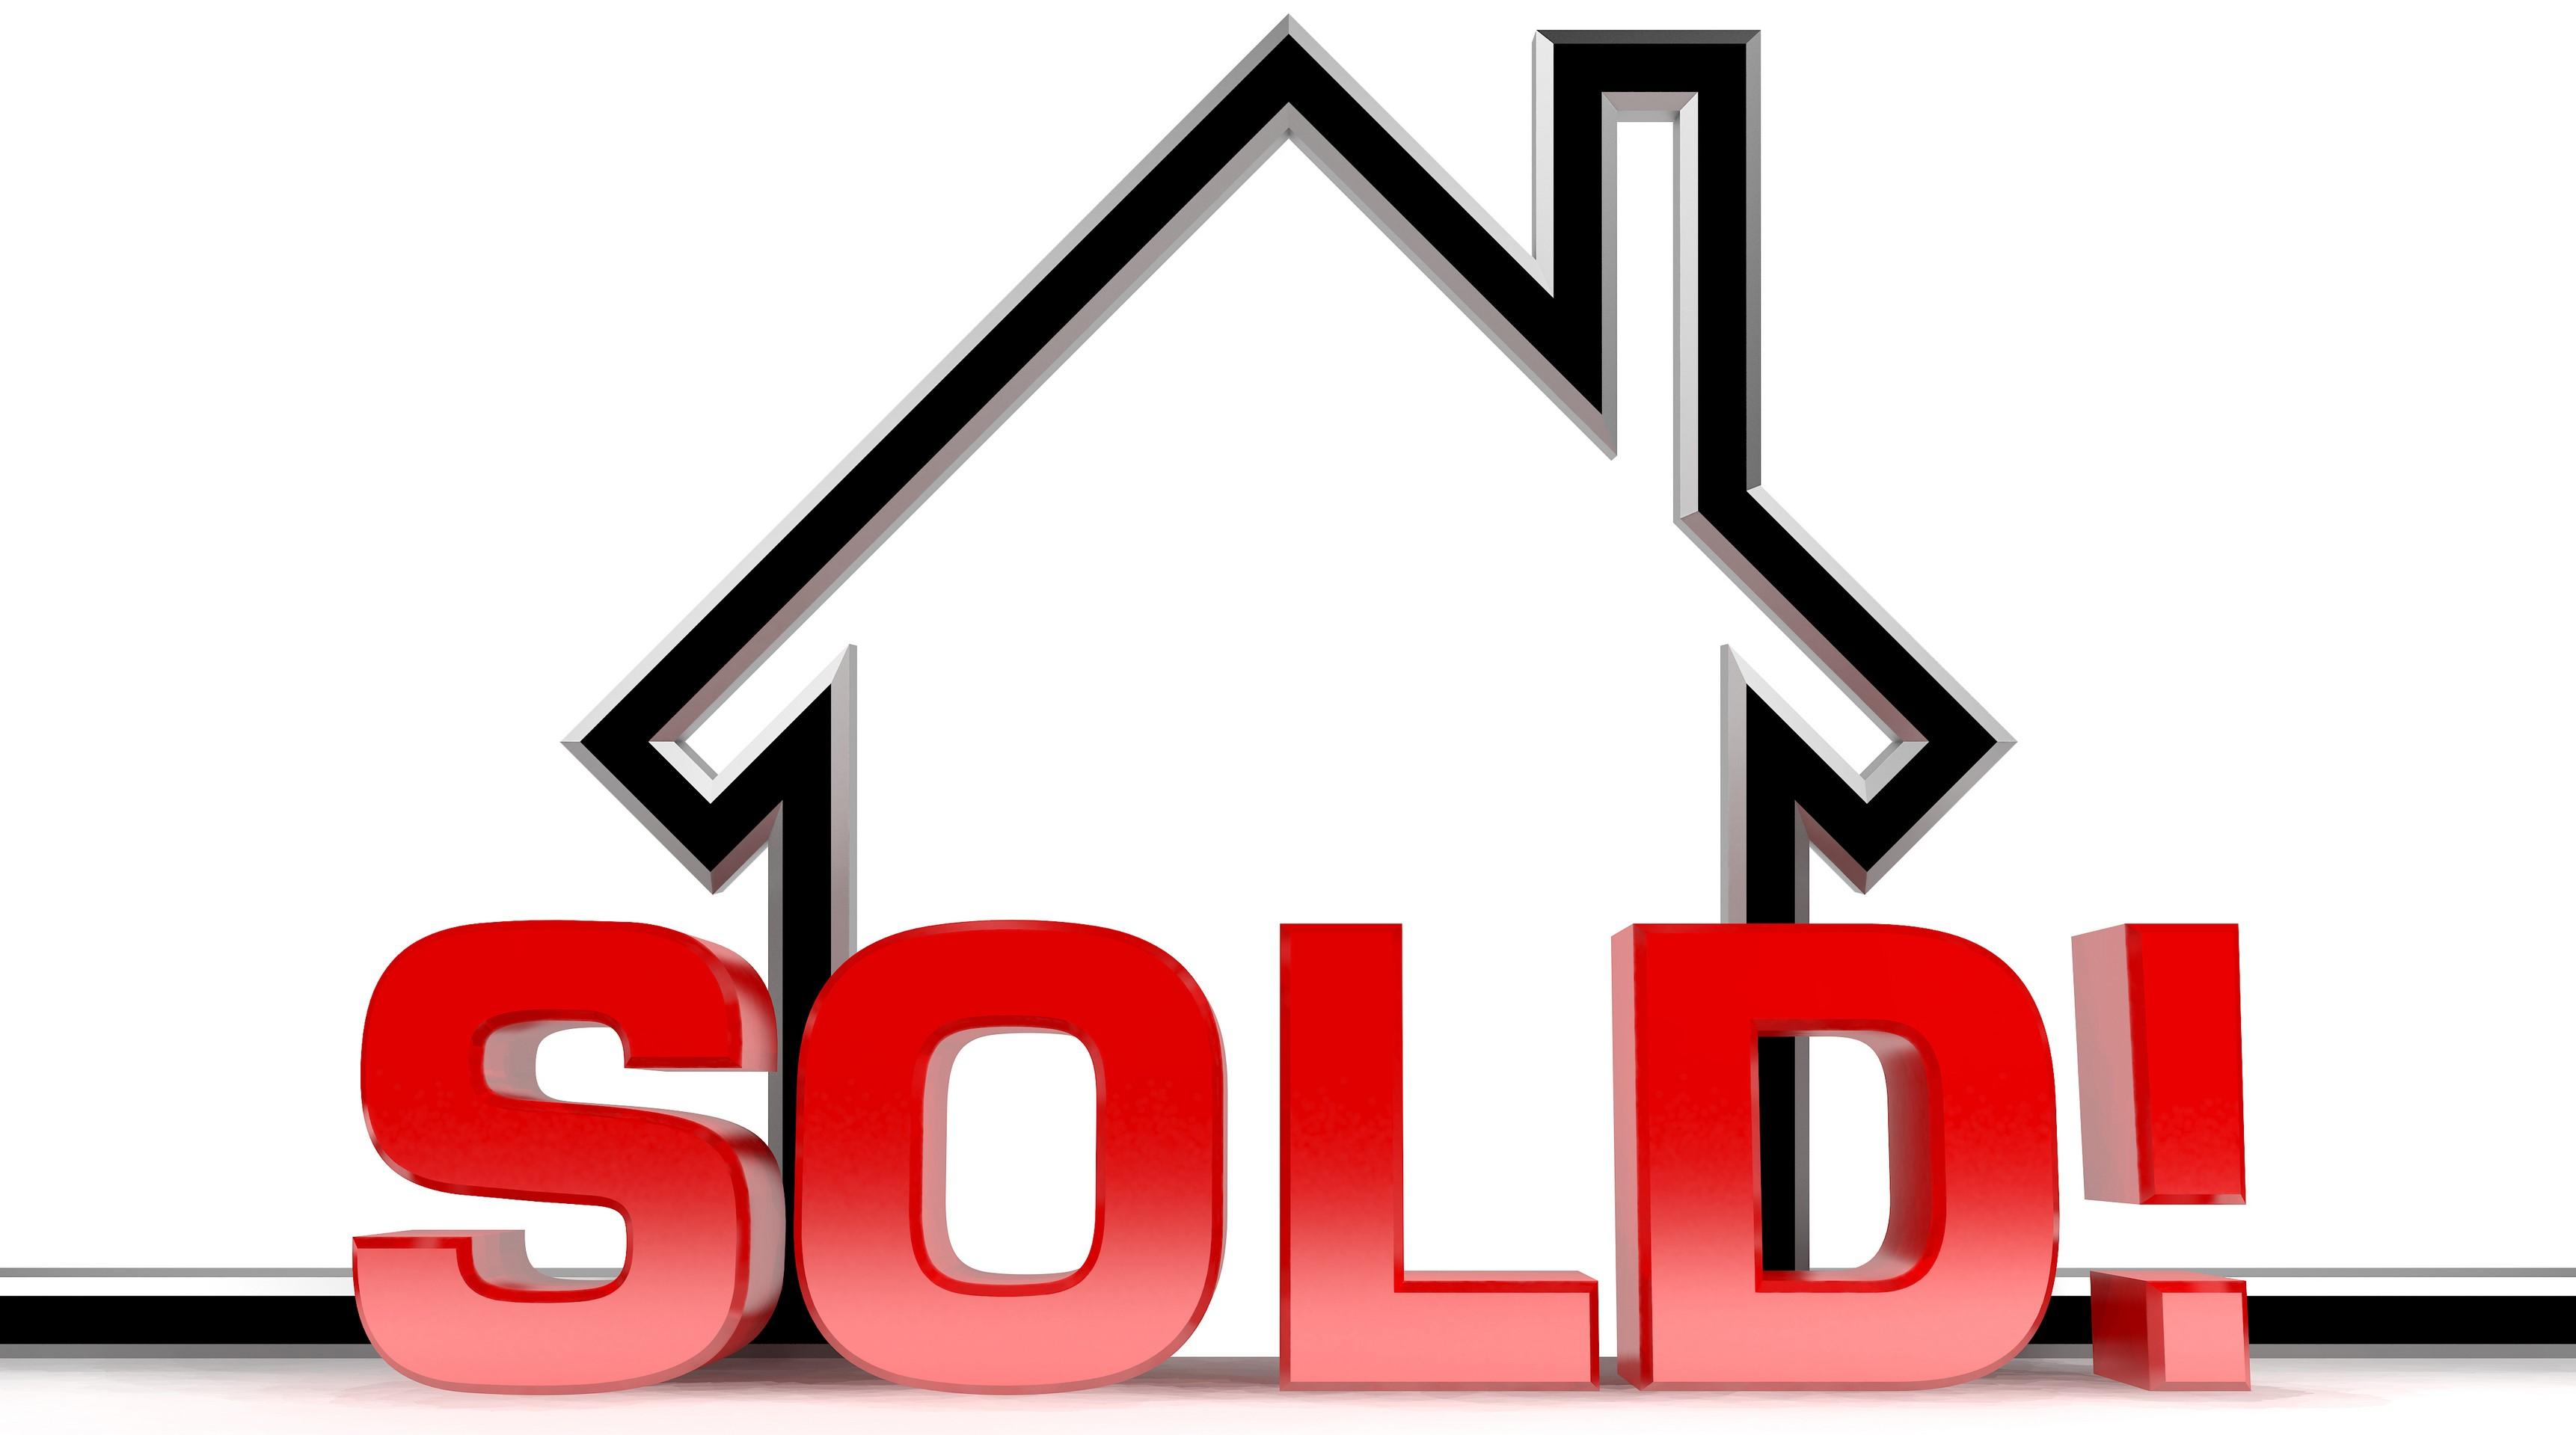 Sold Home 1.jpg